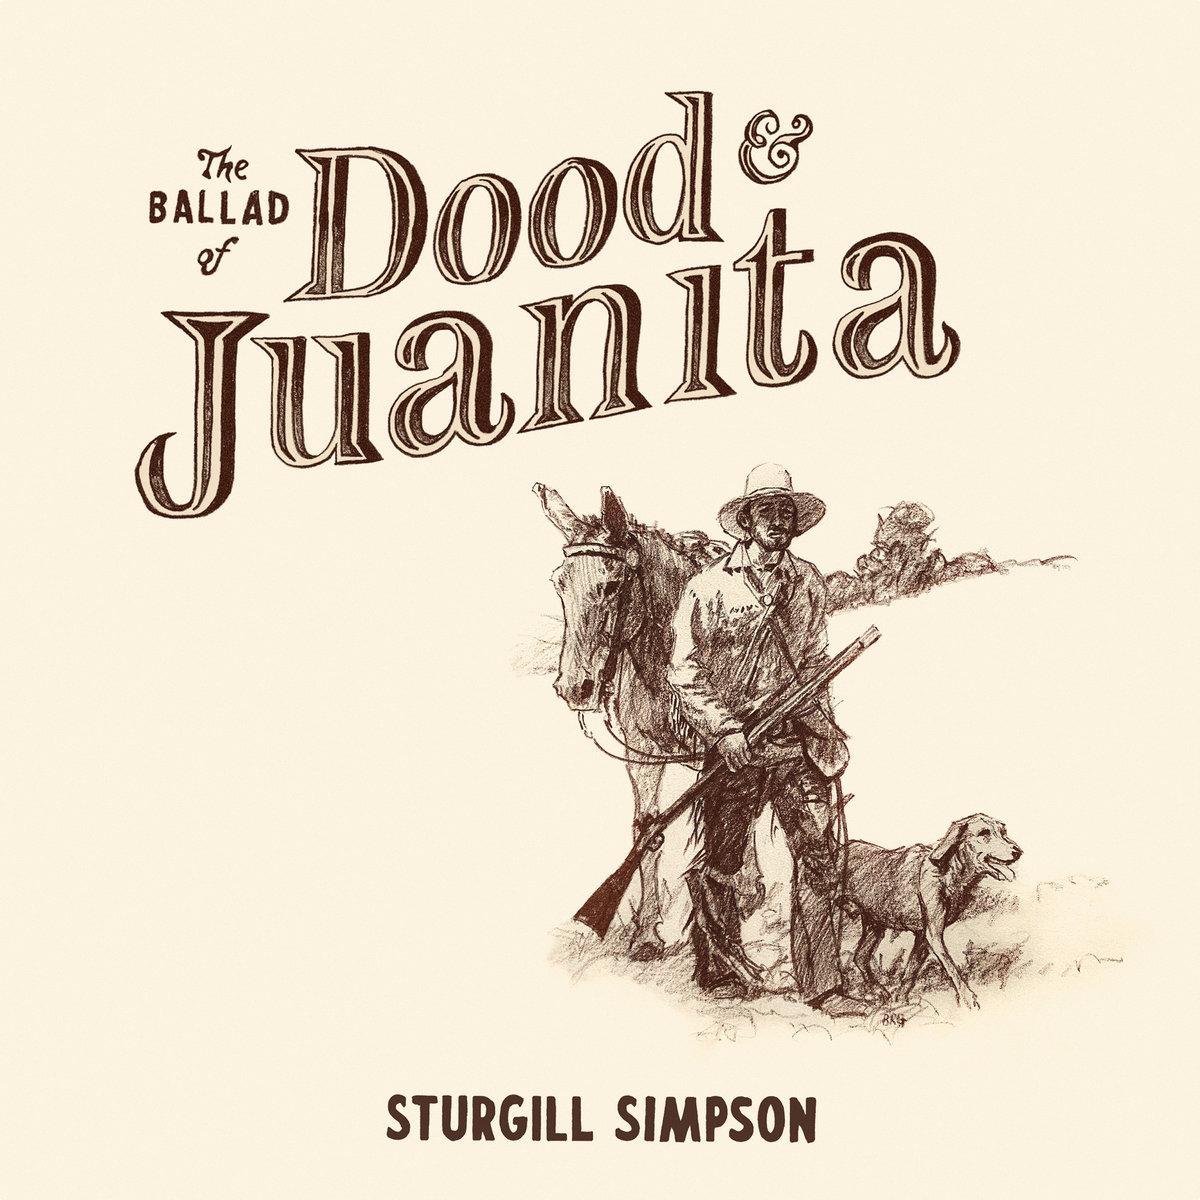 The Ballad of Dood & Juanita | Sturgill Simpson